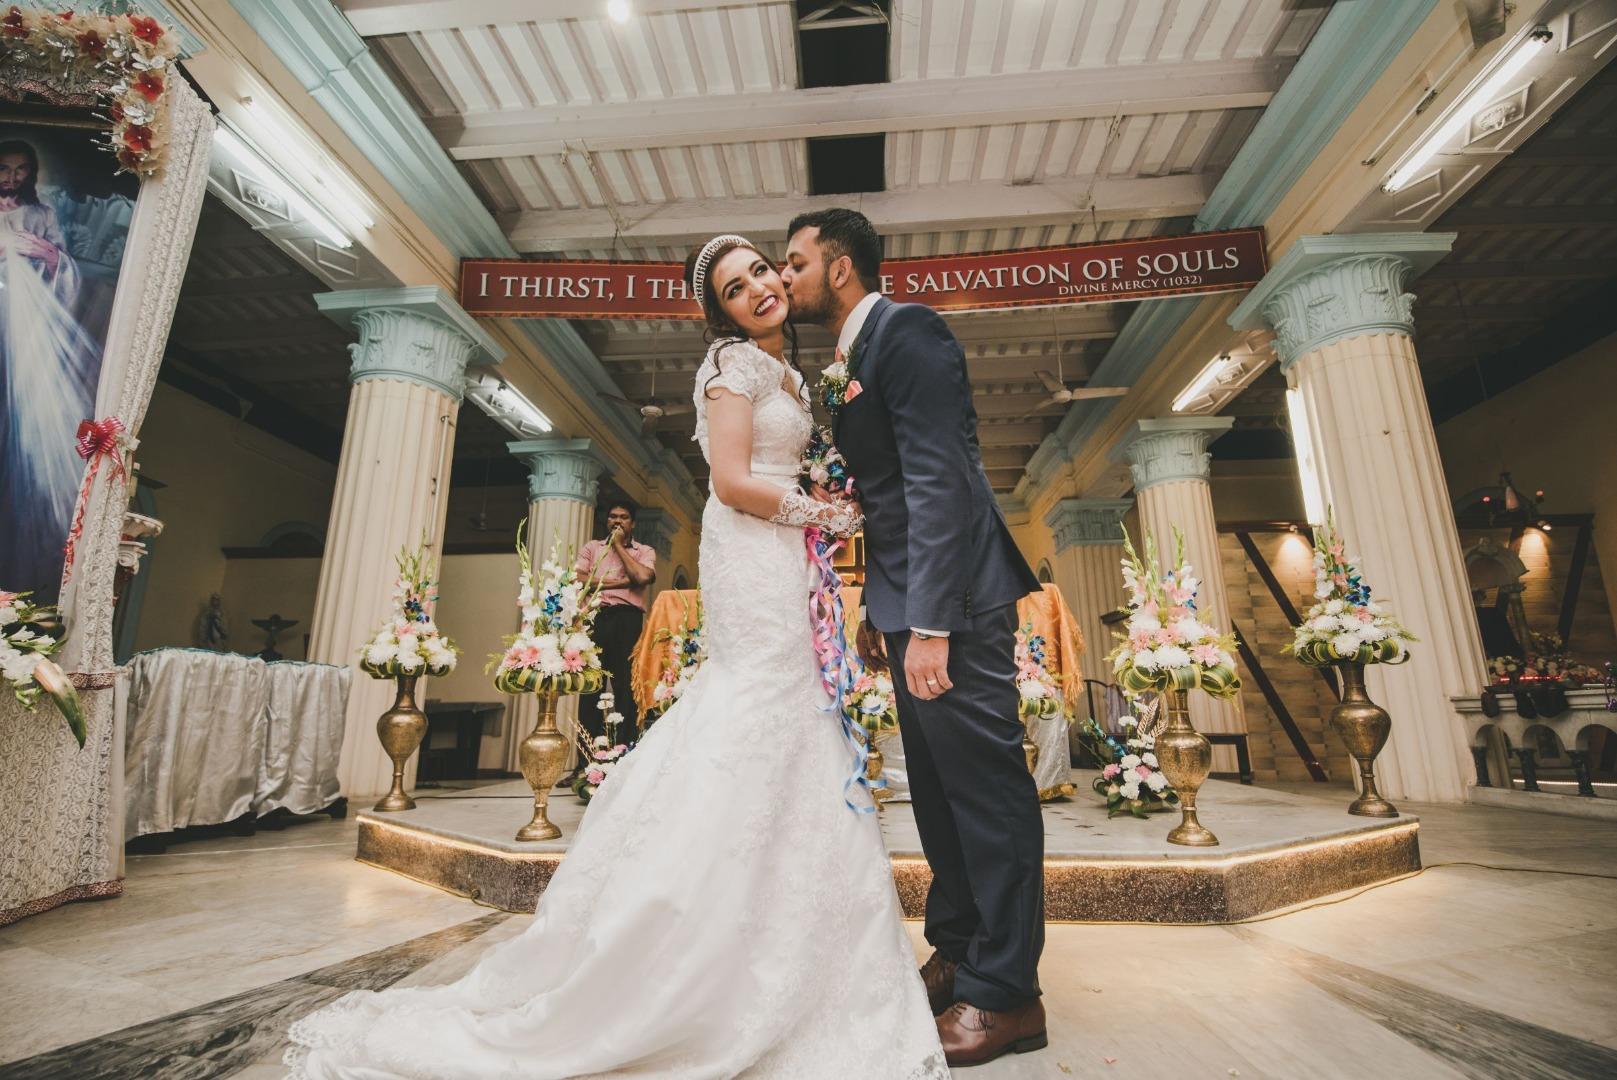 groom kissing on the bride's cheeks